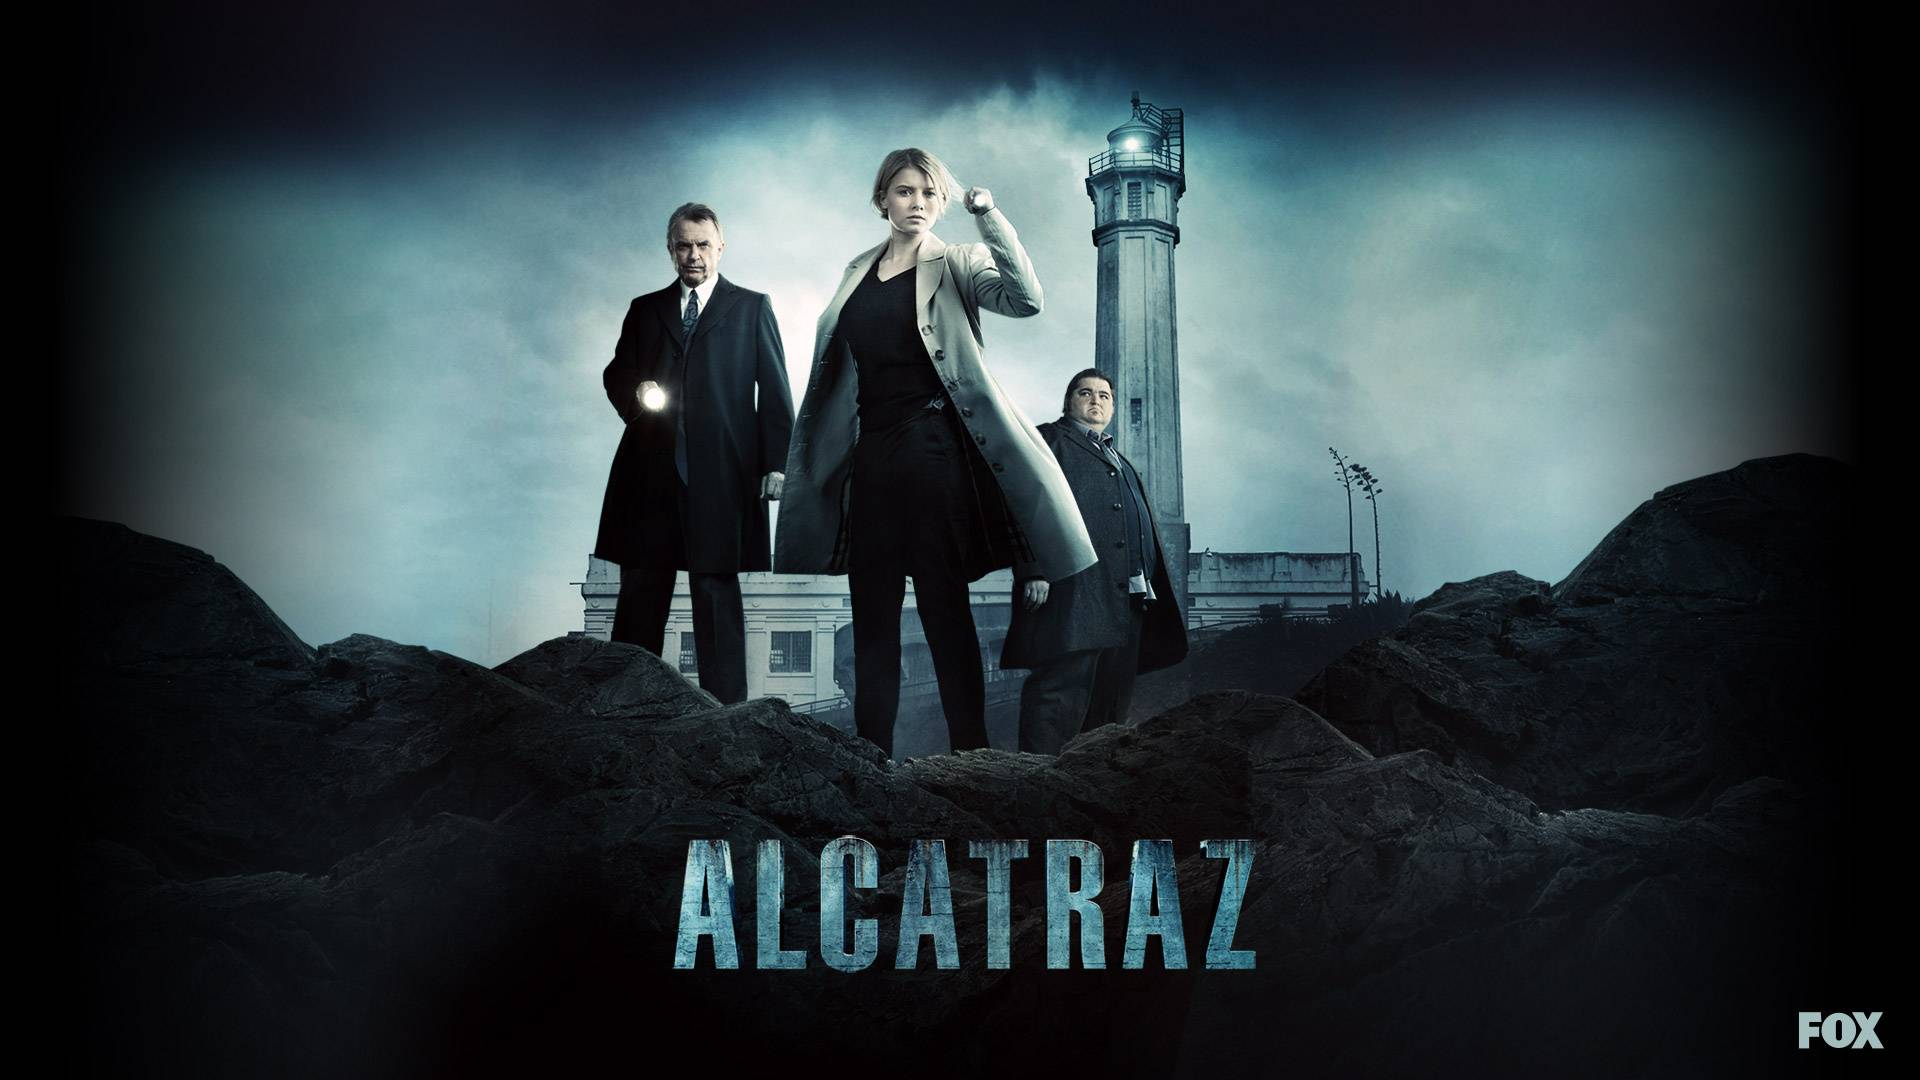 21941_alcatraz_wallpaper_03_122_135lo.jpg